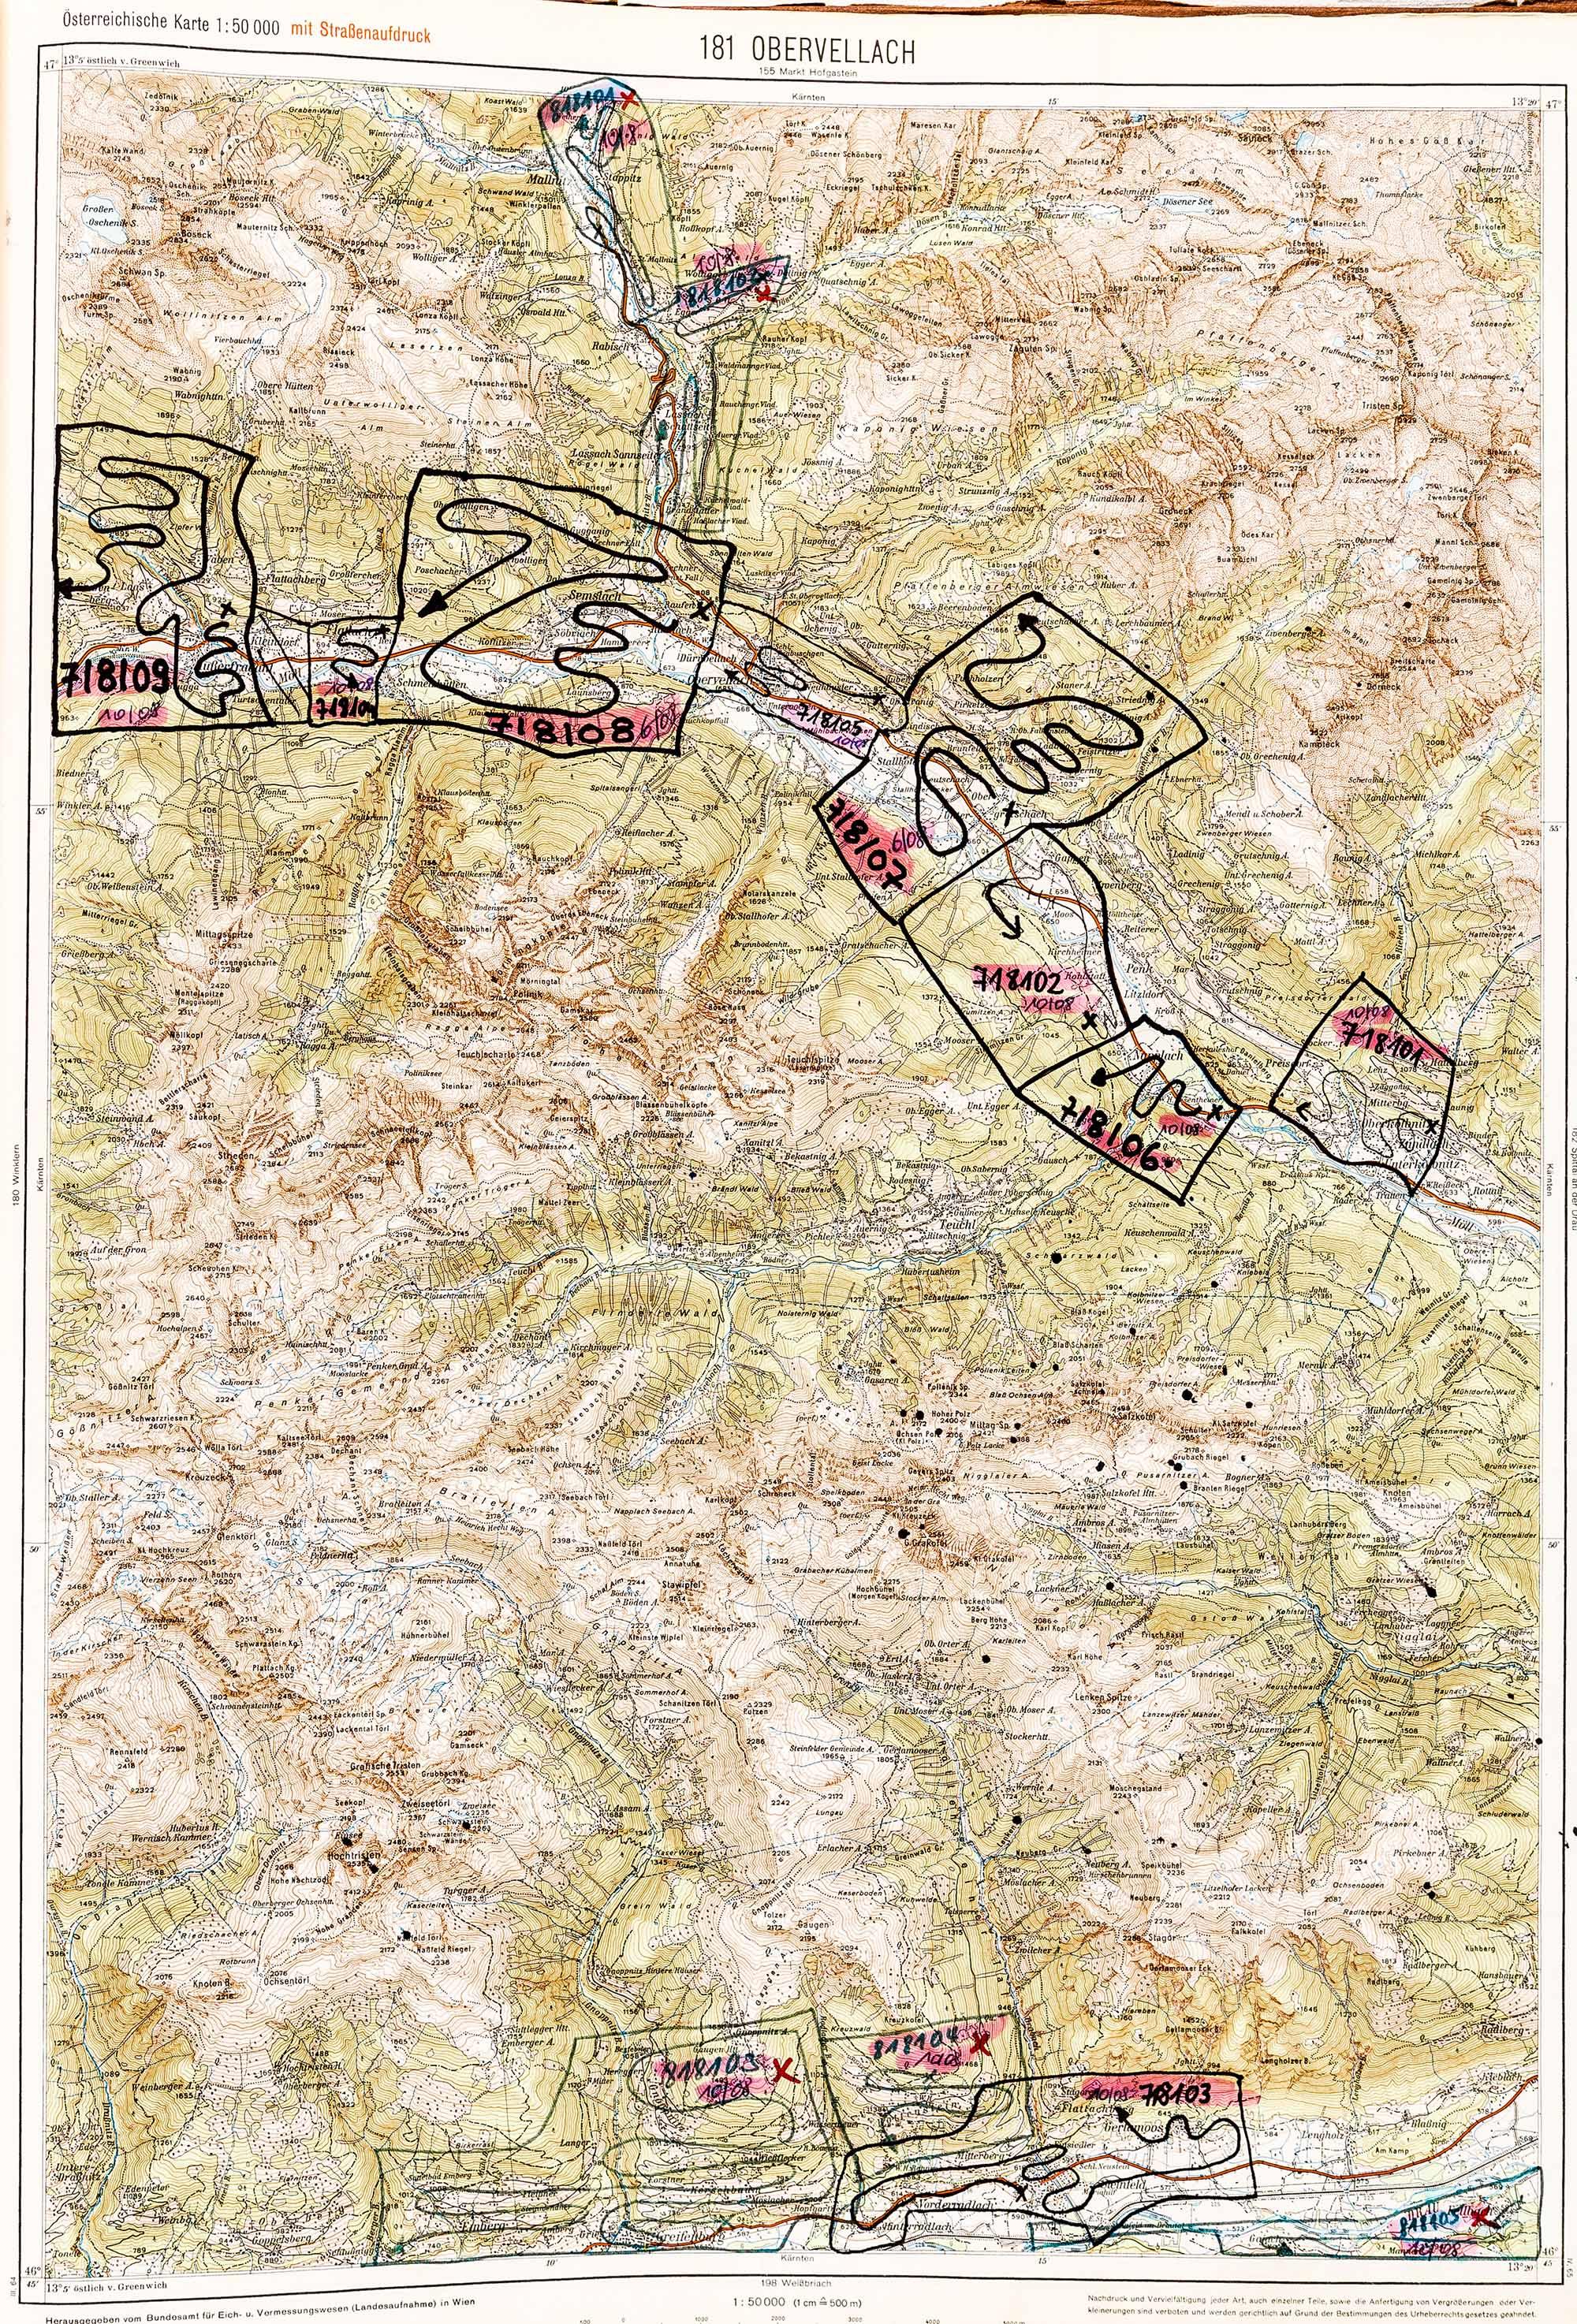 1975-1979 Karte 181